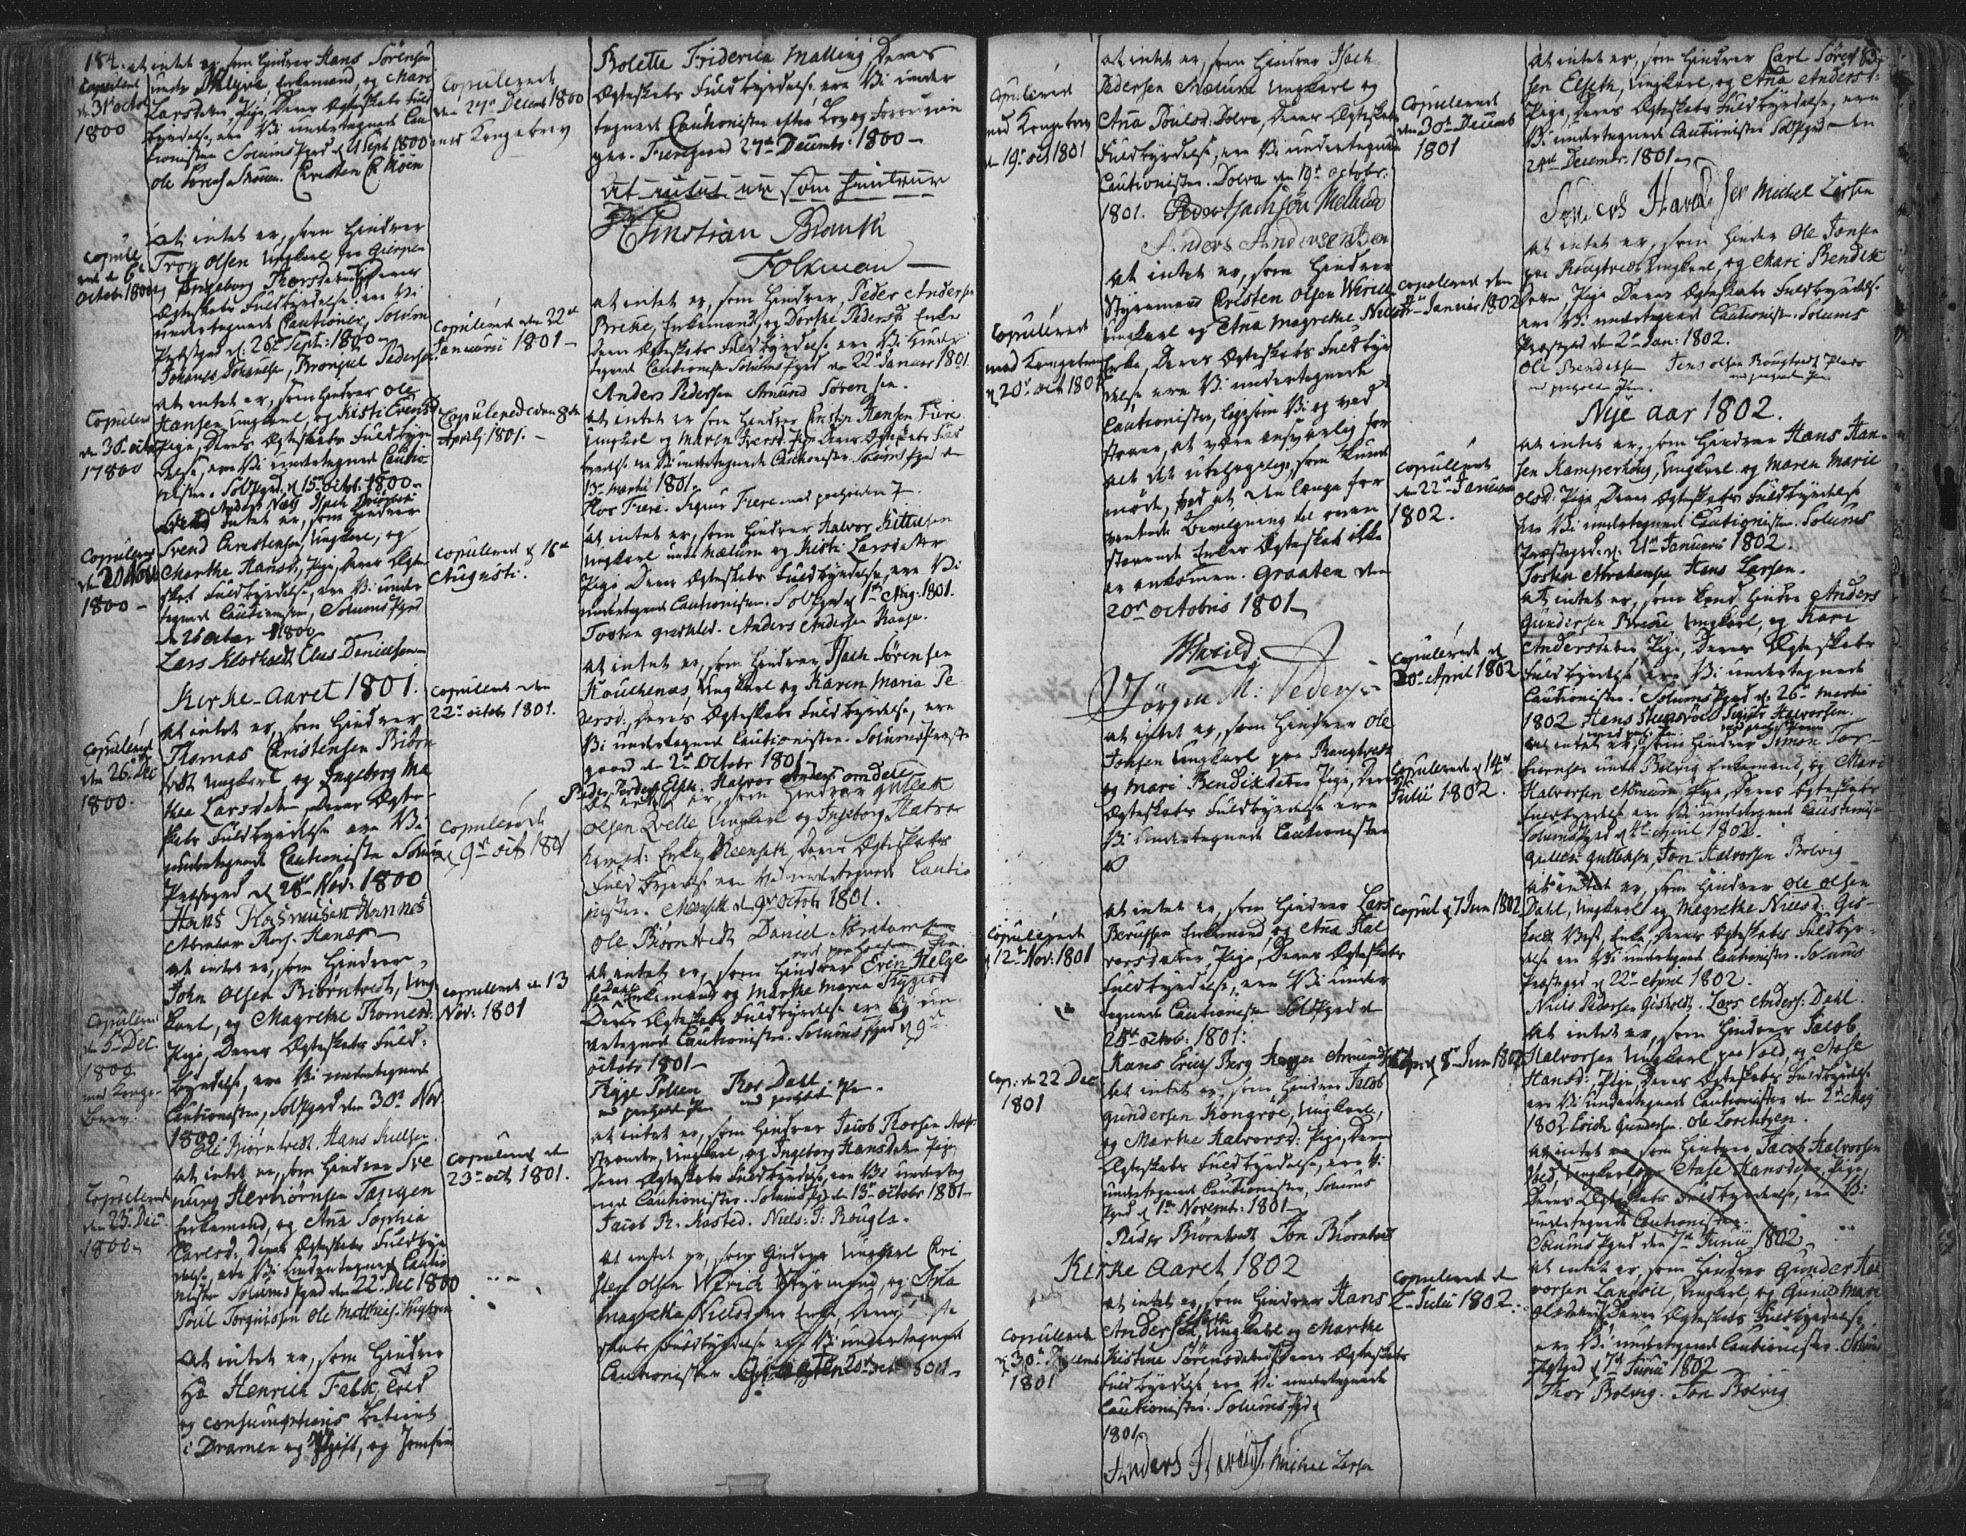 SAKO, Solum kirkebøker, F/Fa/L0003: Ministerialbok nr. I 3, 1761-1814, s. 184-185